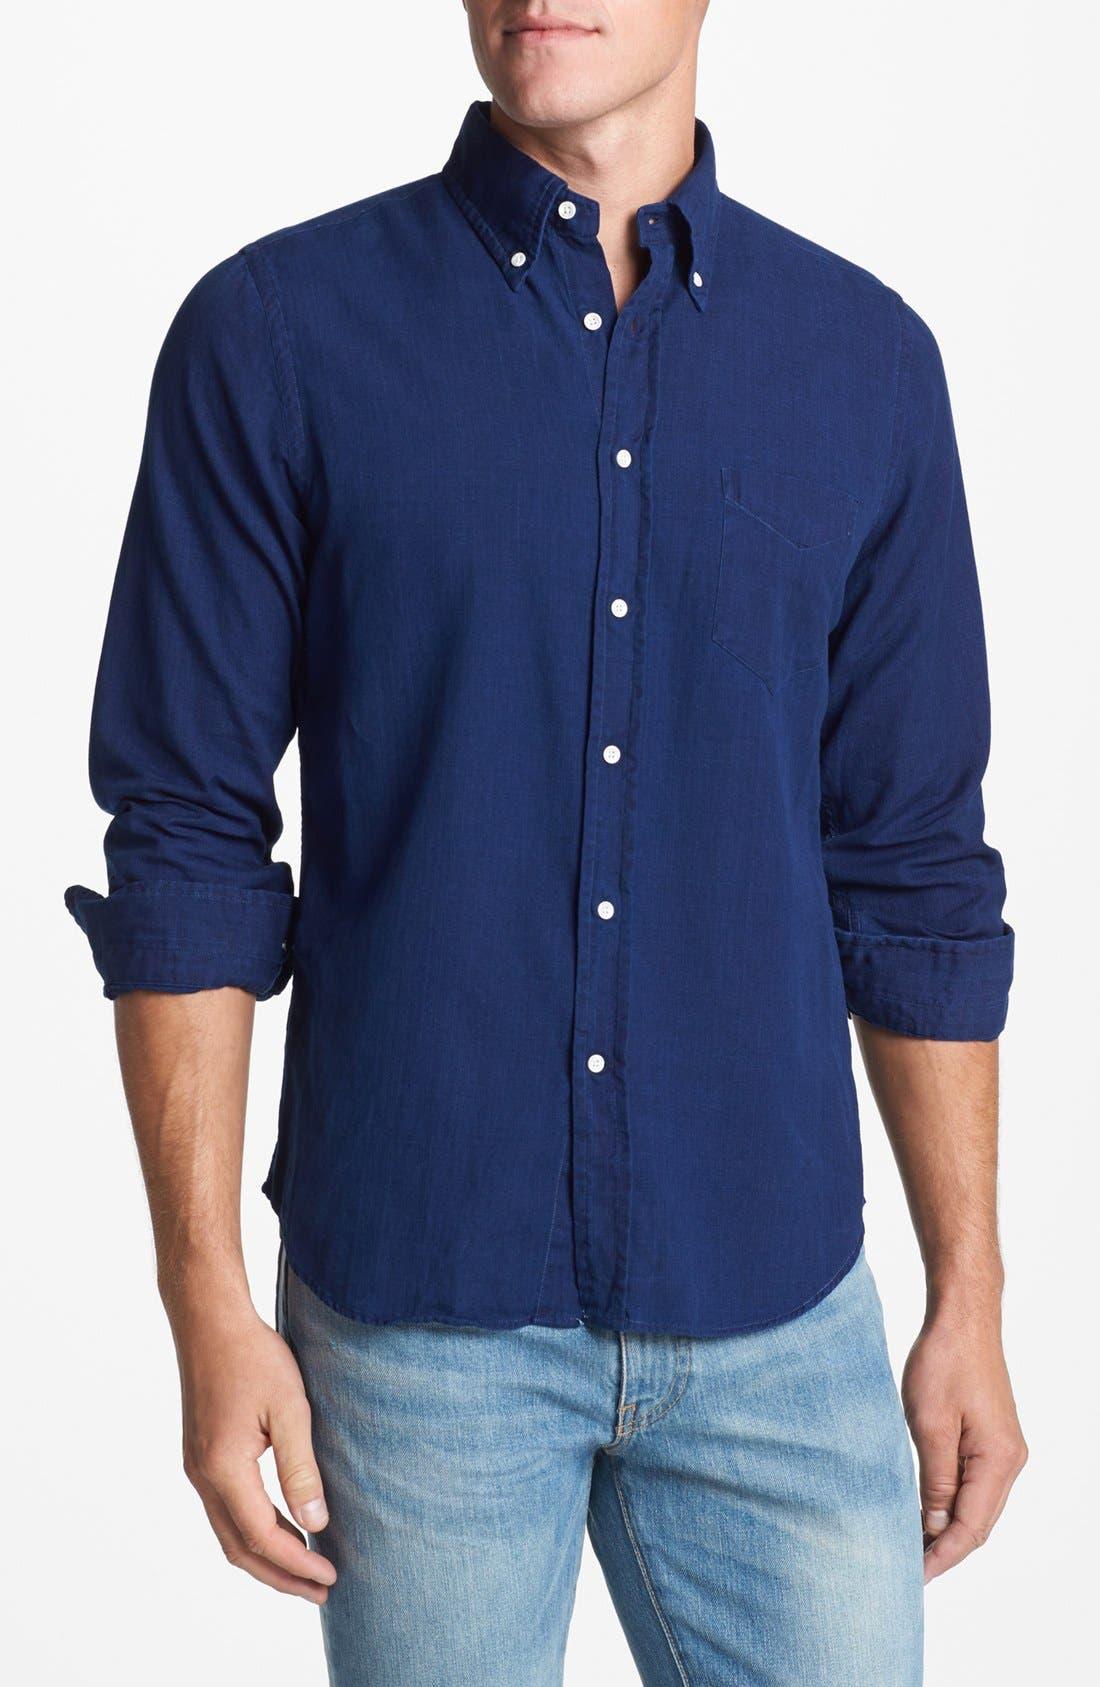 Main Image - Gant Rugger Indigo Oxford Shirt